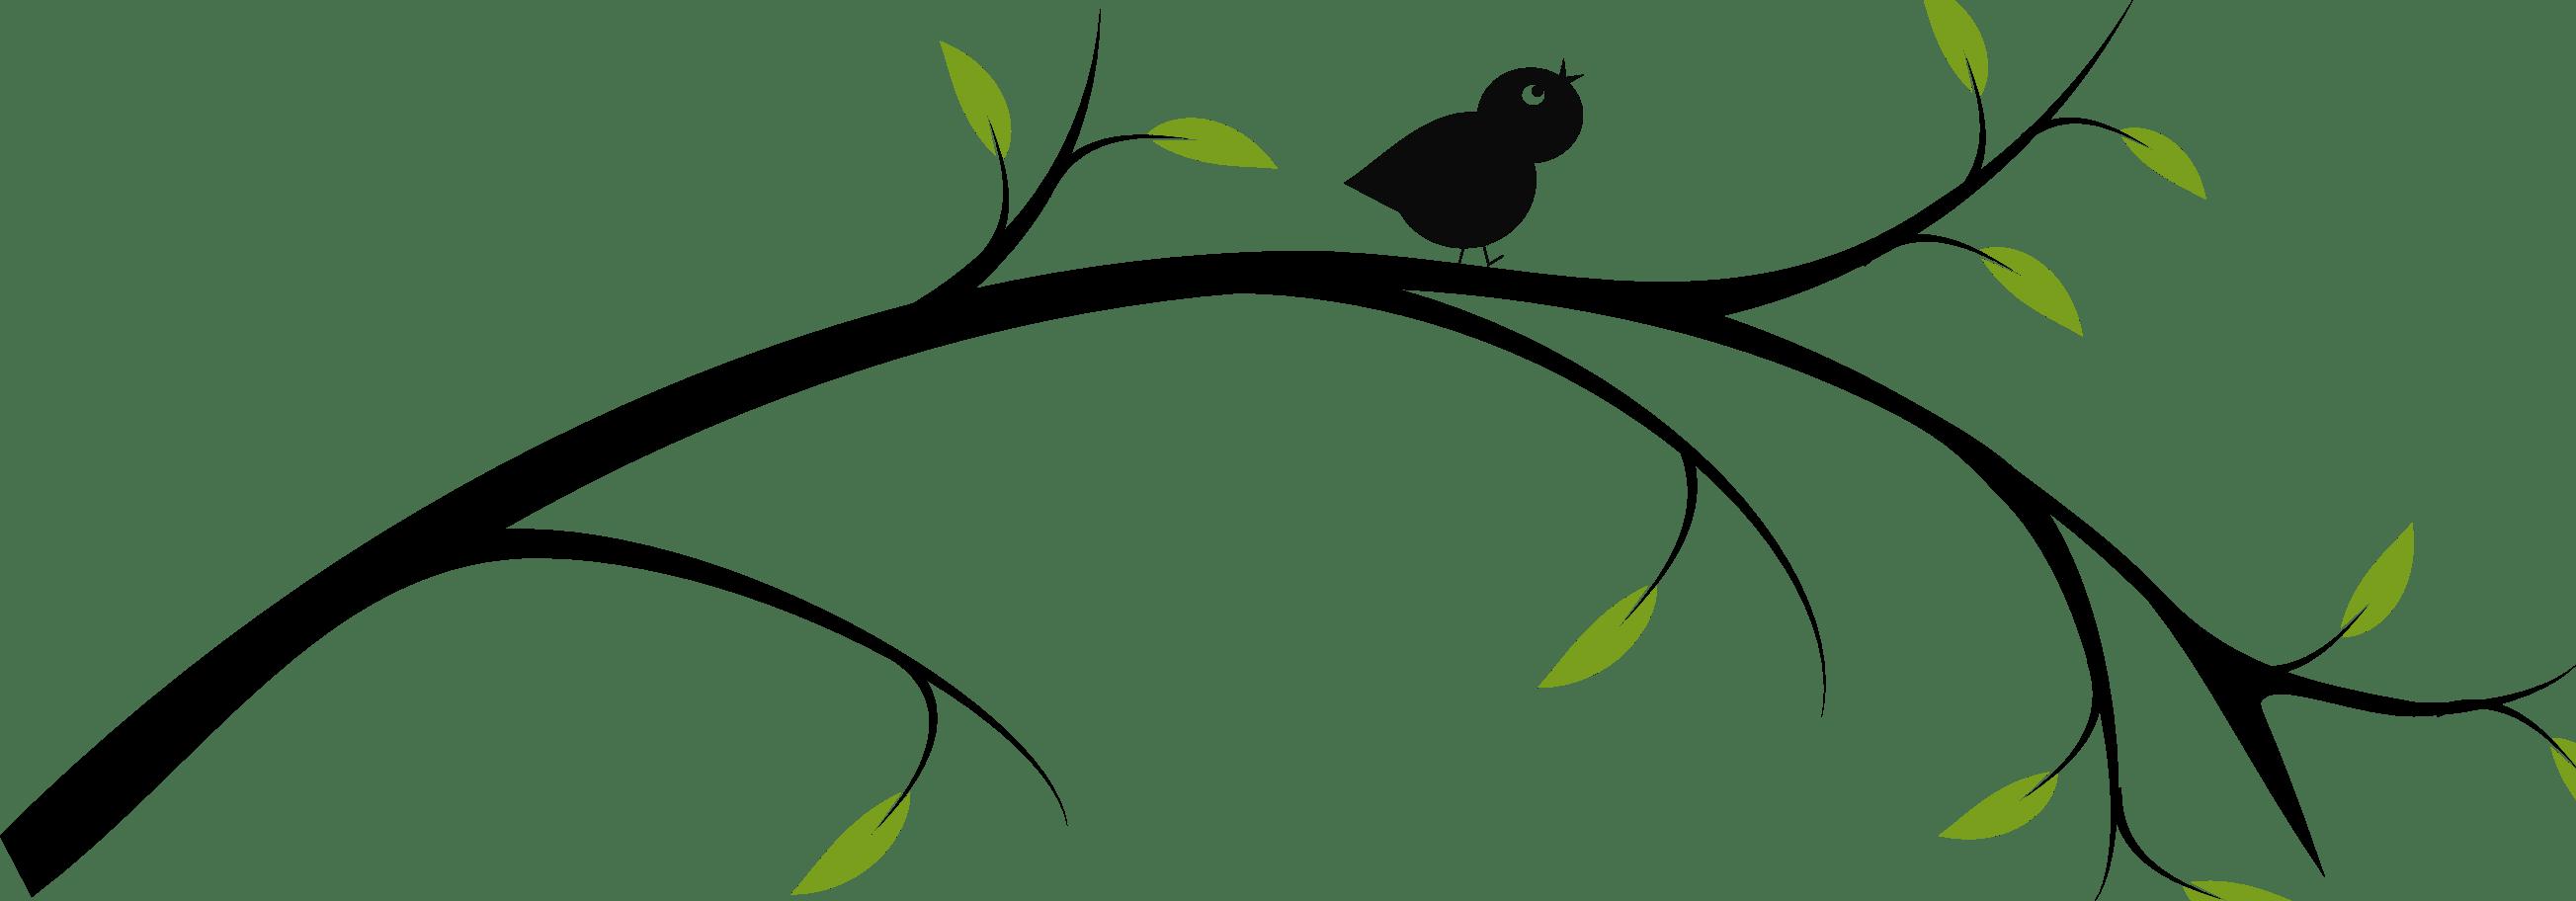 Vines Clipart Bird Vines Bird Transparent Free For